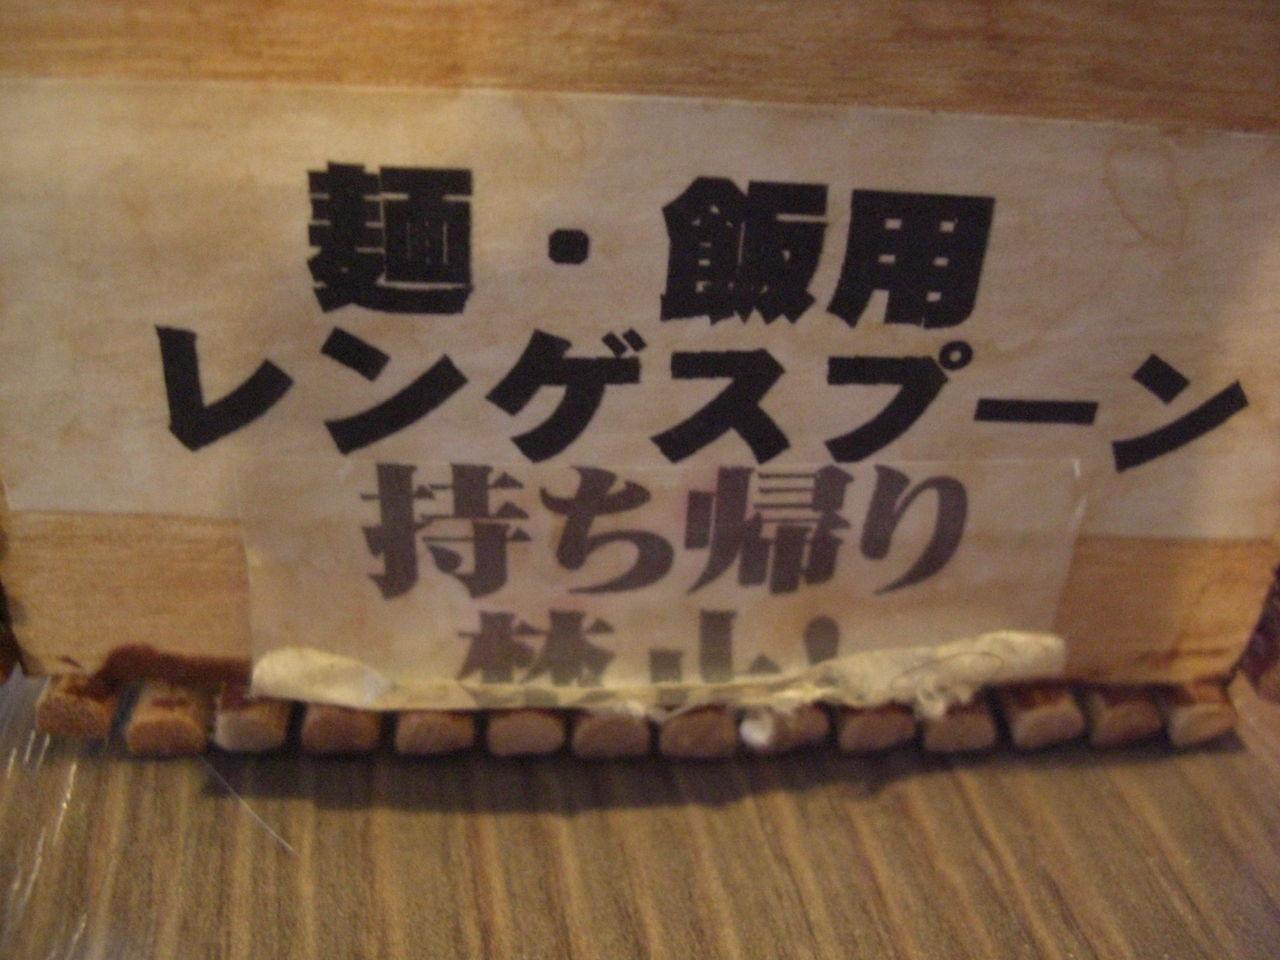 http://livedoor.blogimg.jp/hjhnjhnjhgf/imgs/a/3/a3ef5e6e.jpg